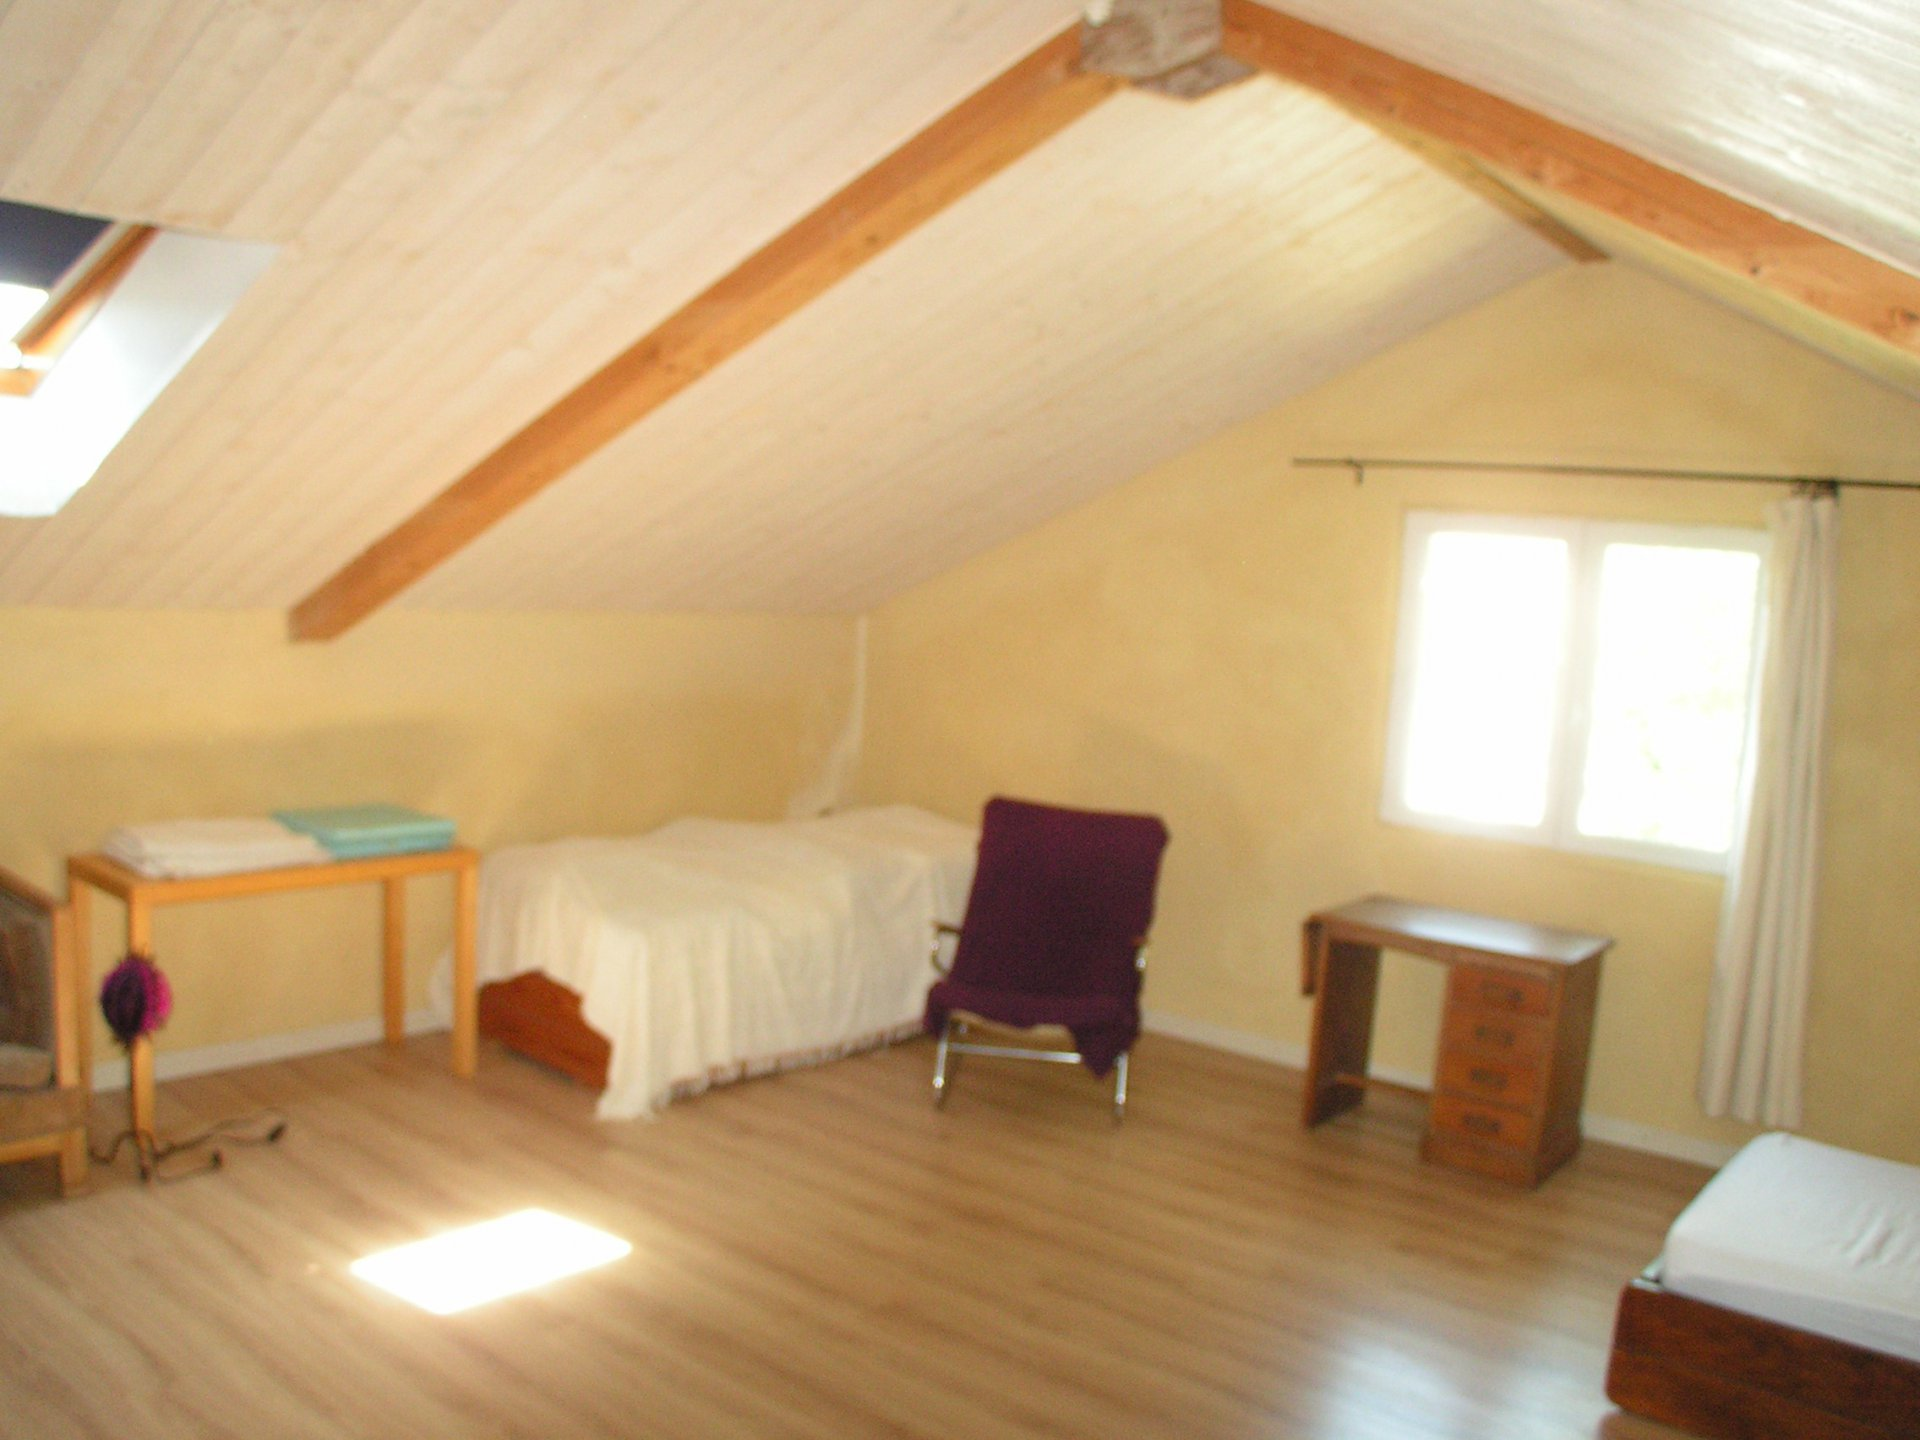 Te koop: ruim huis in Saint-Jean-le-Centenier, Ardèche